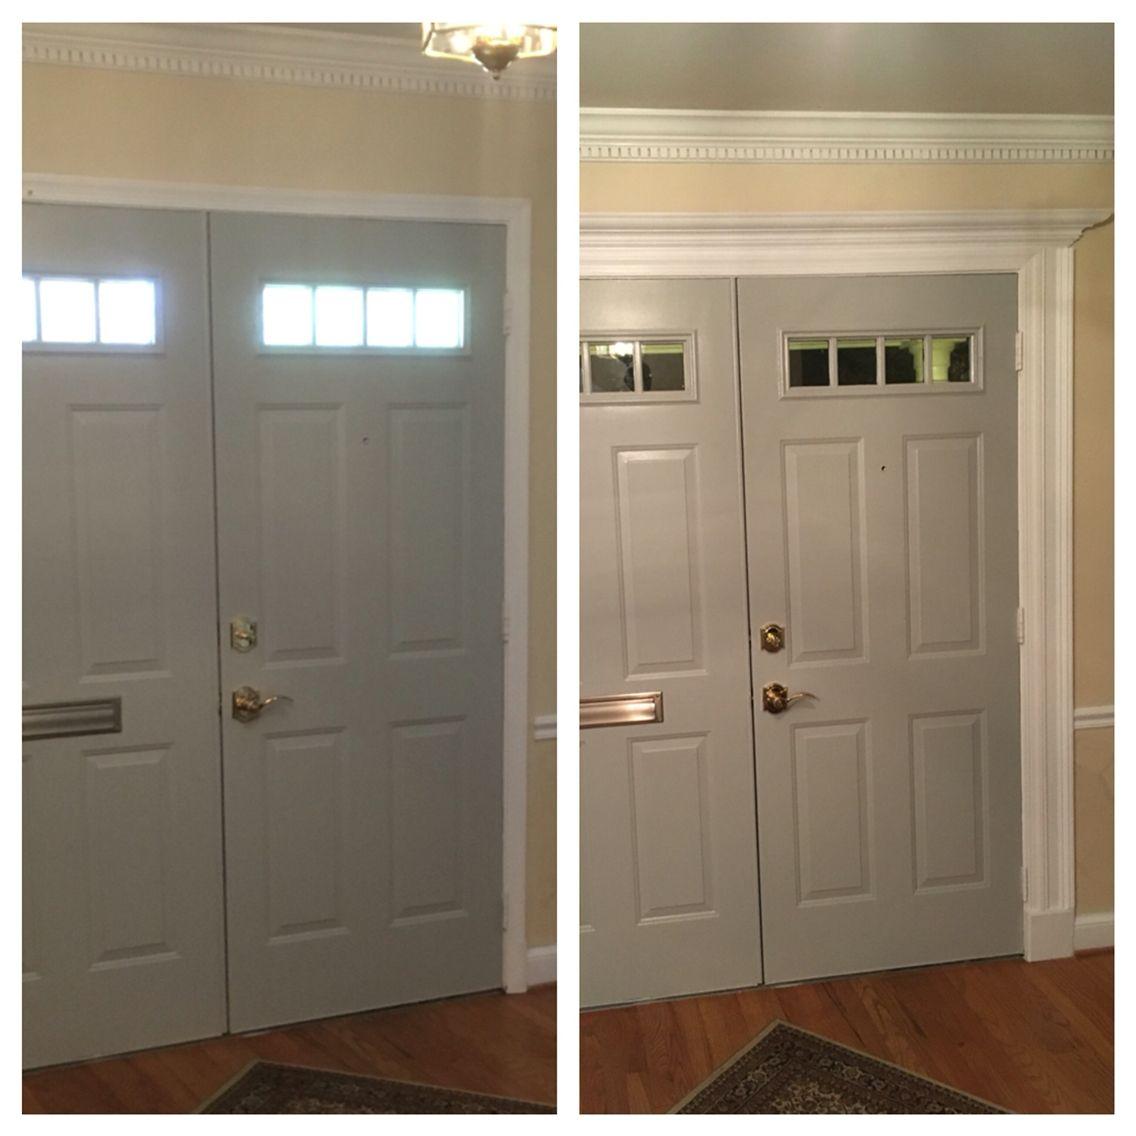 Diy Entry Door Easy Adding Trim To Enhance Entryway Diy Stuff